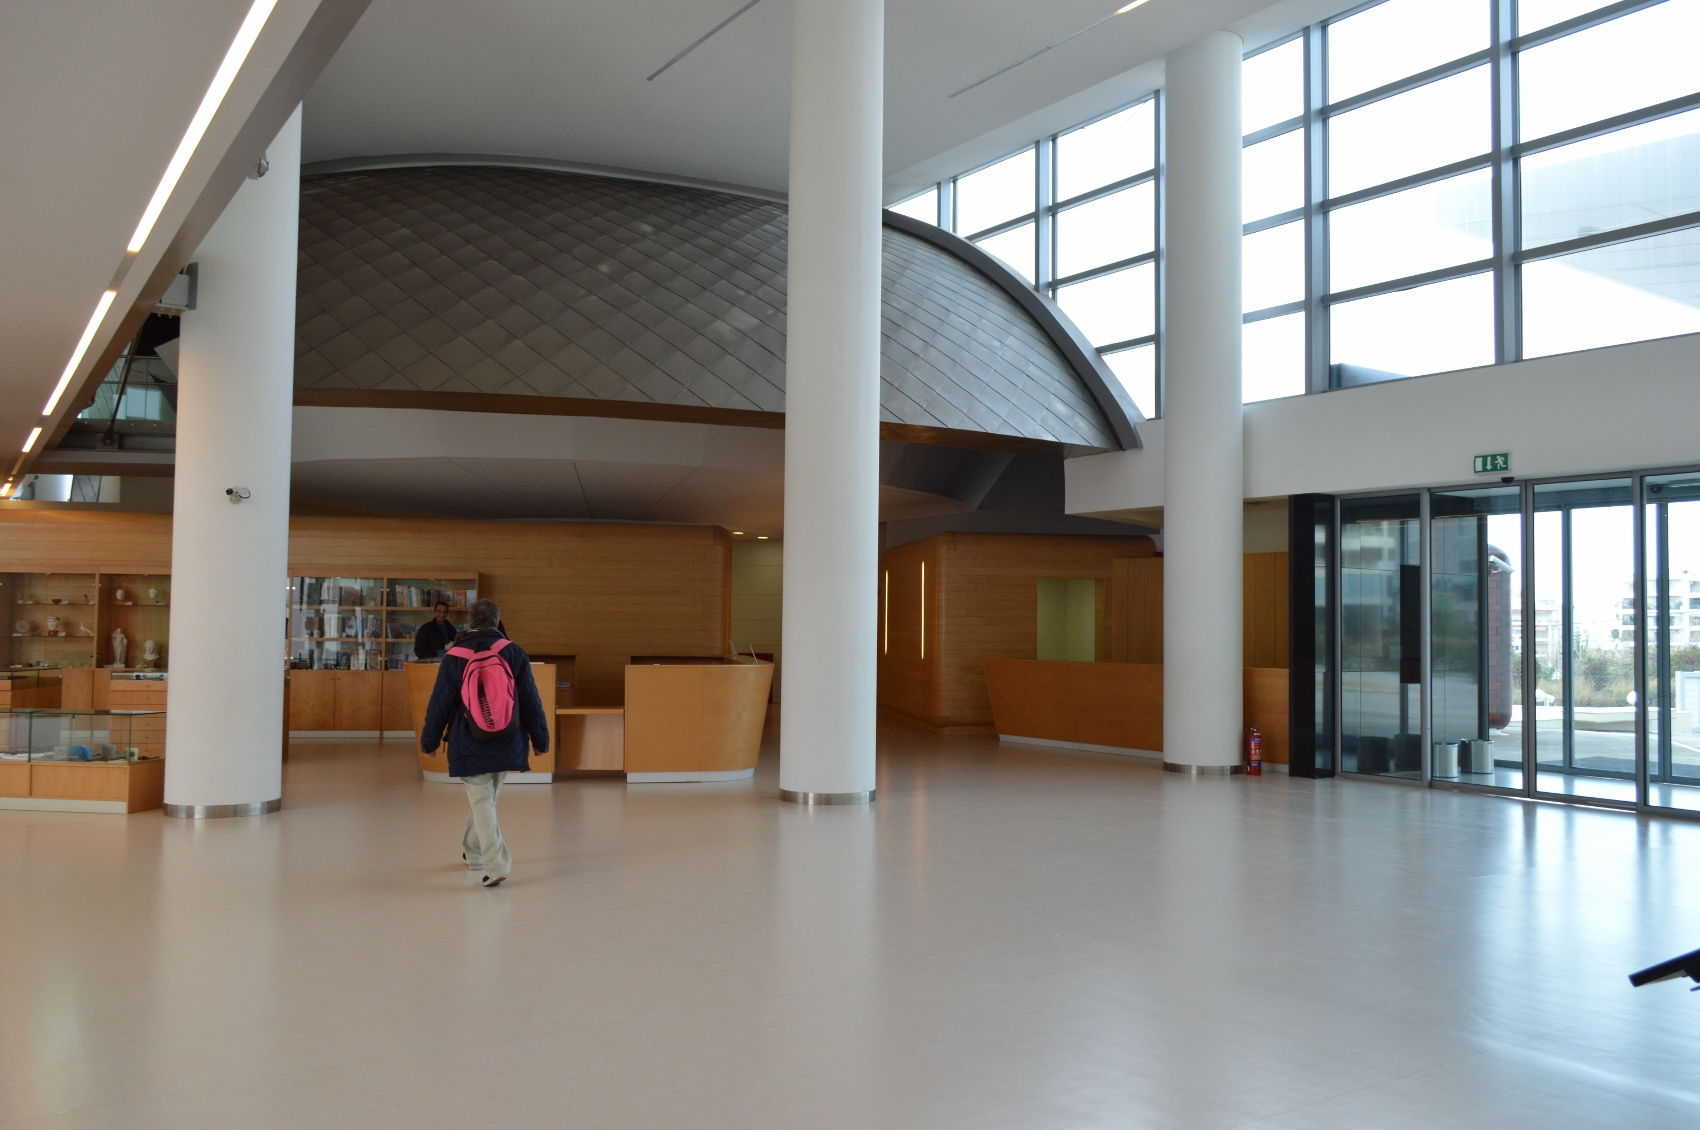 museet-billetsalg